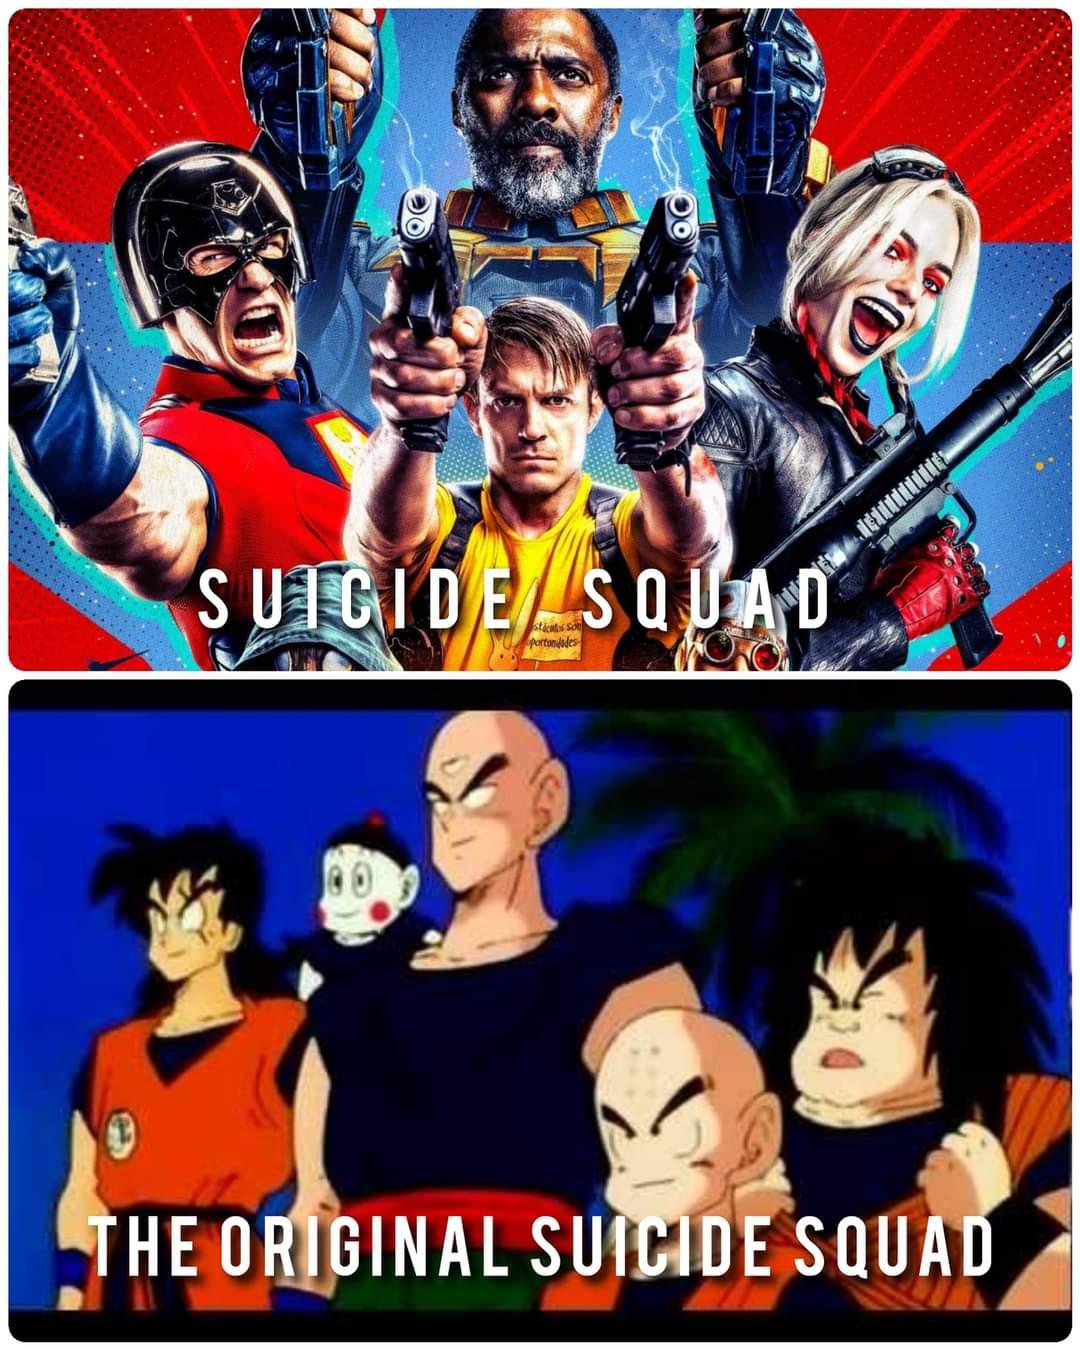 Memes Dragon ball Z suicide squad